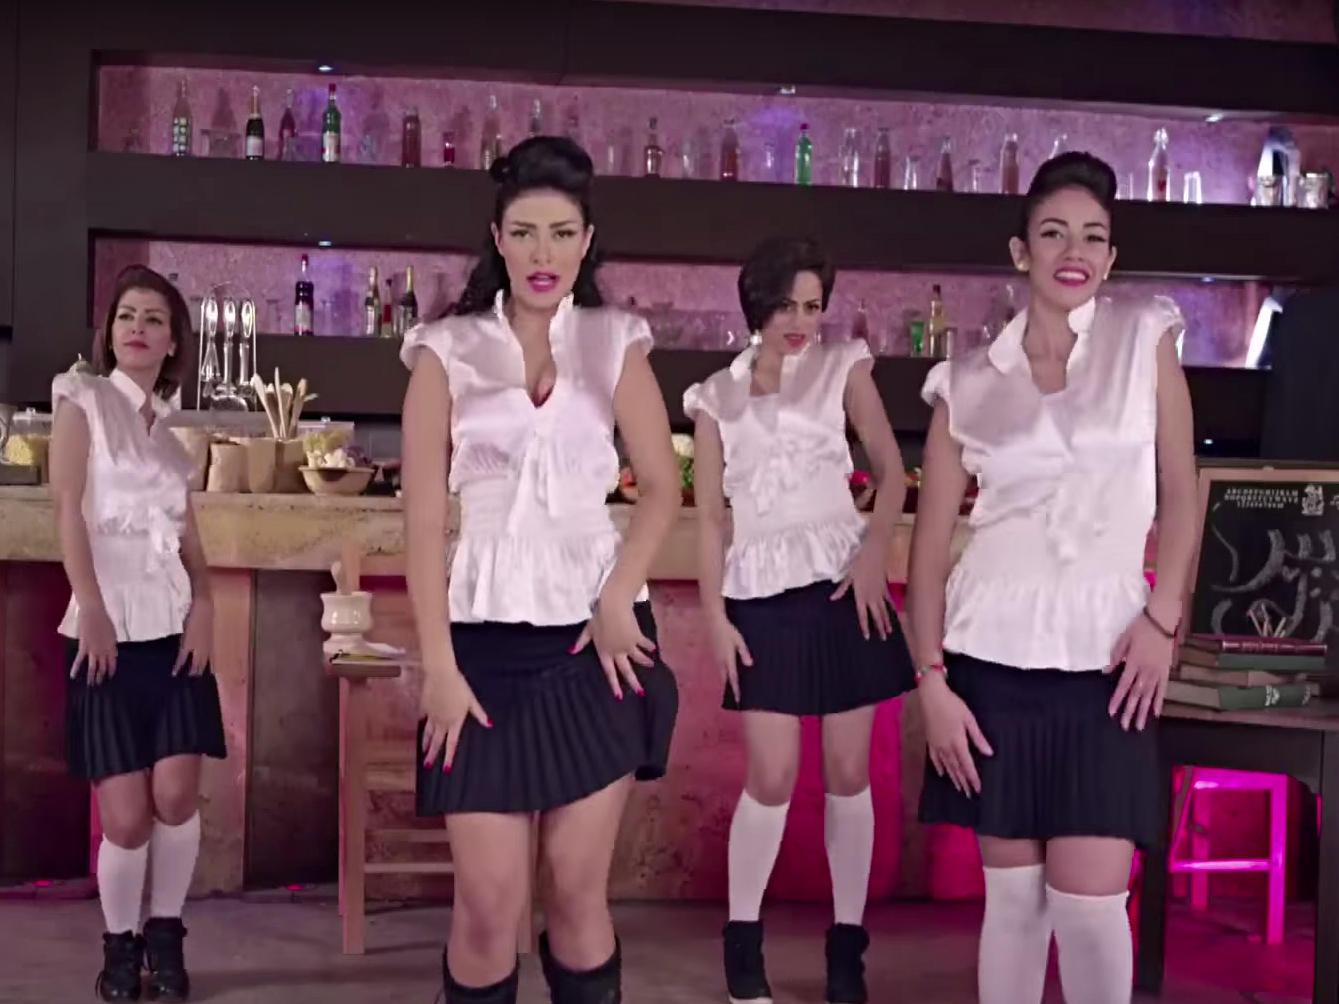 Egypt's Morality Crackdown Targets Female Dancers | Texas Public Radio